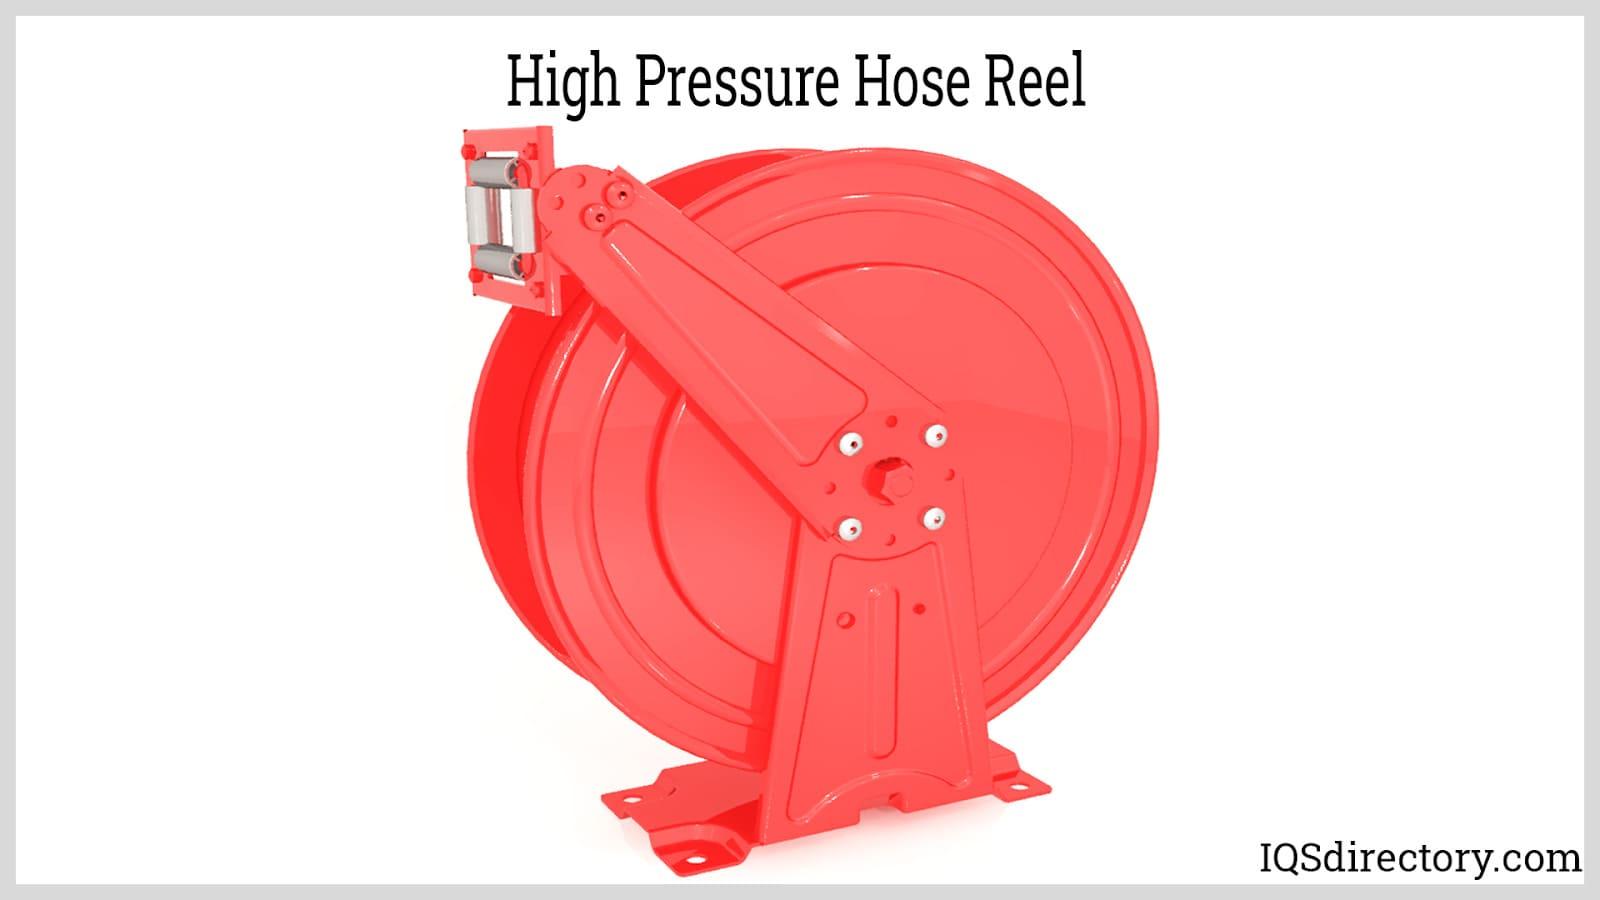 High Pressure Hose Reel